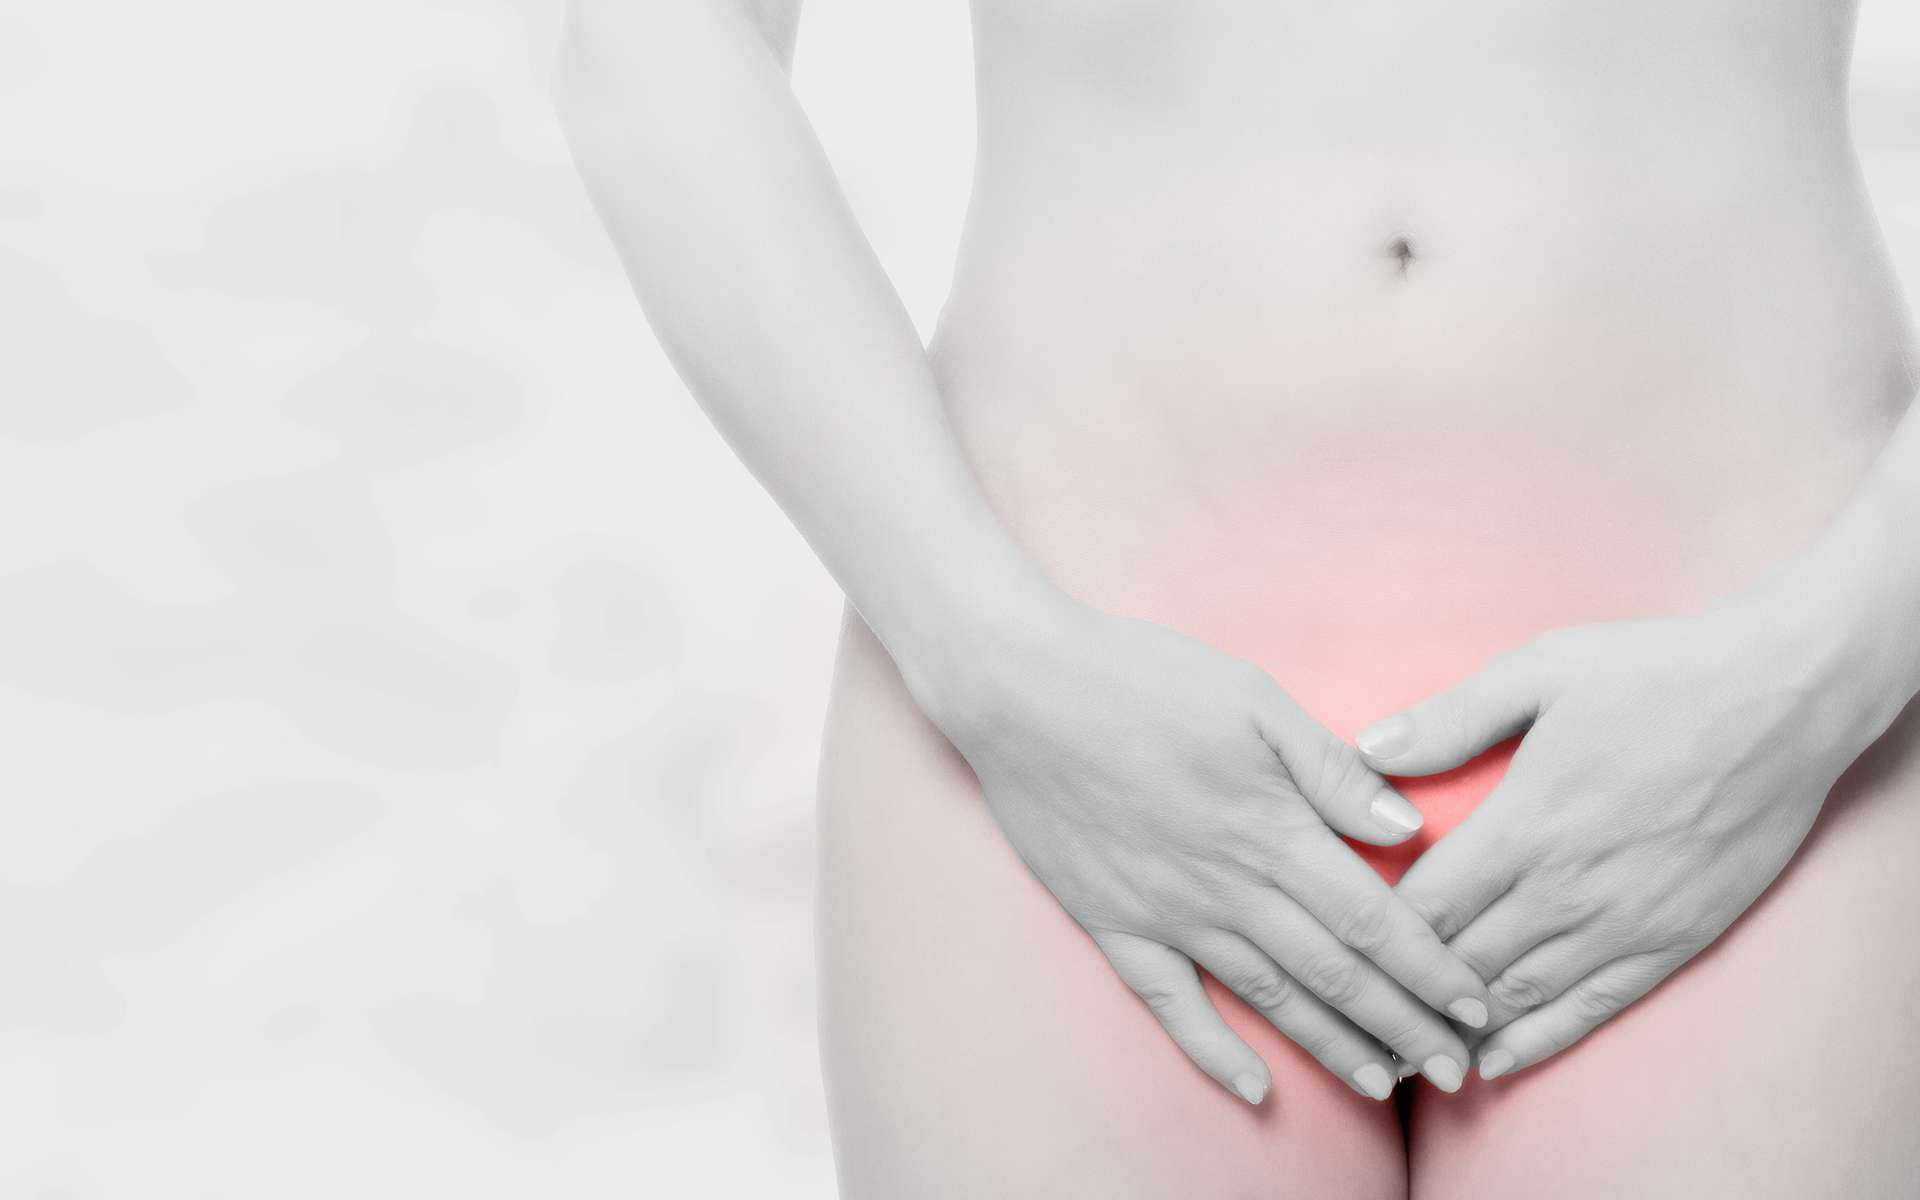 Douleur dans l'appareil génital féminin. © Sentello, Adobe stock